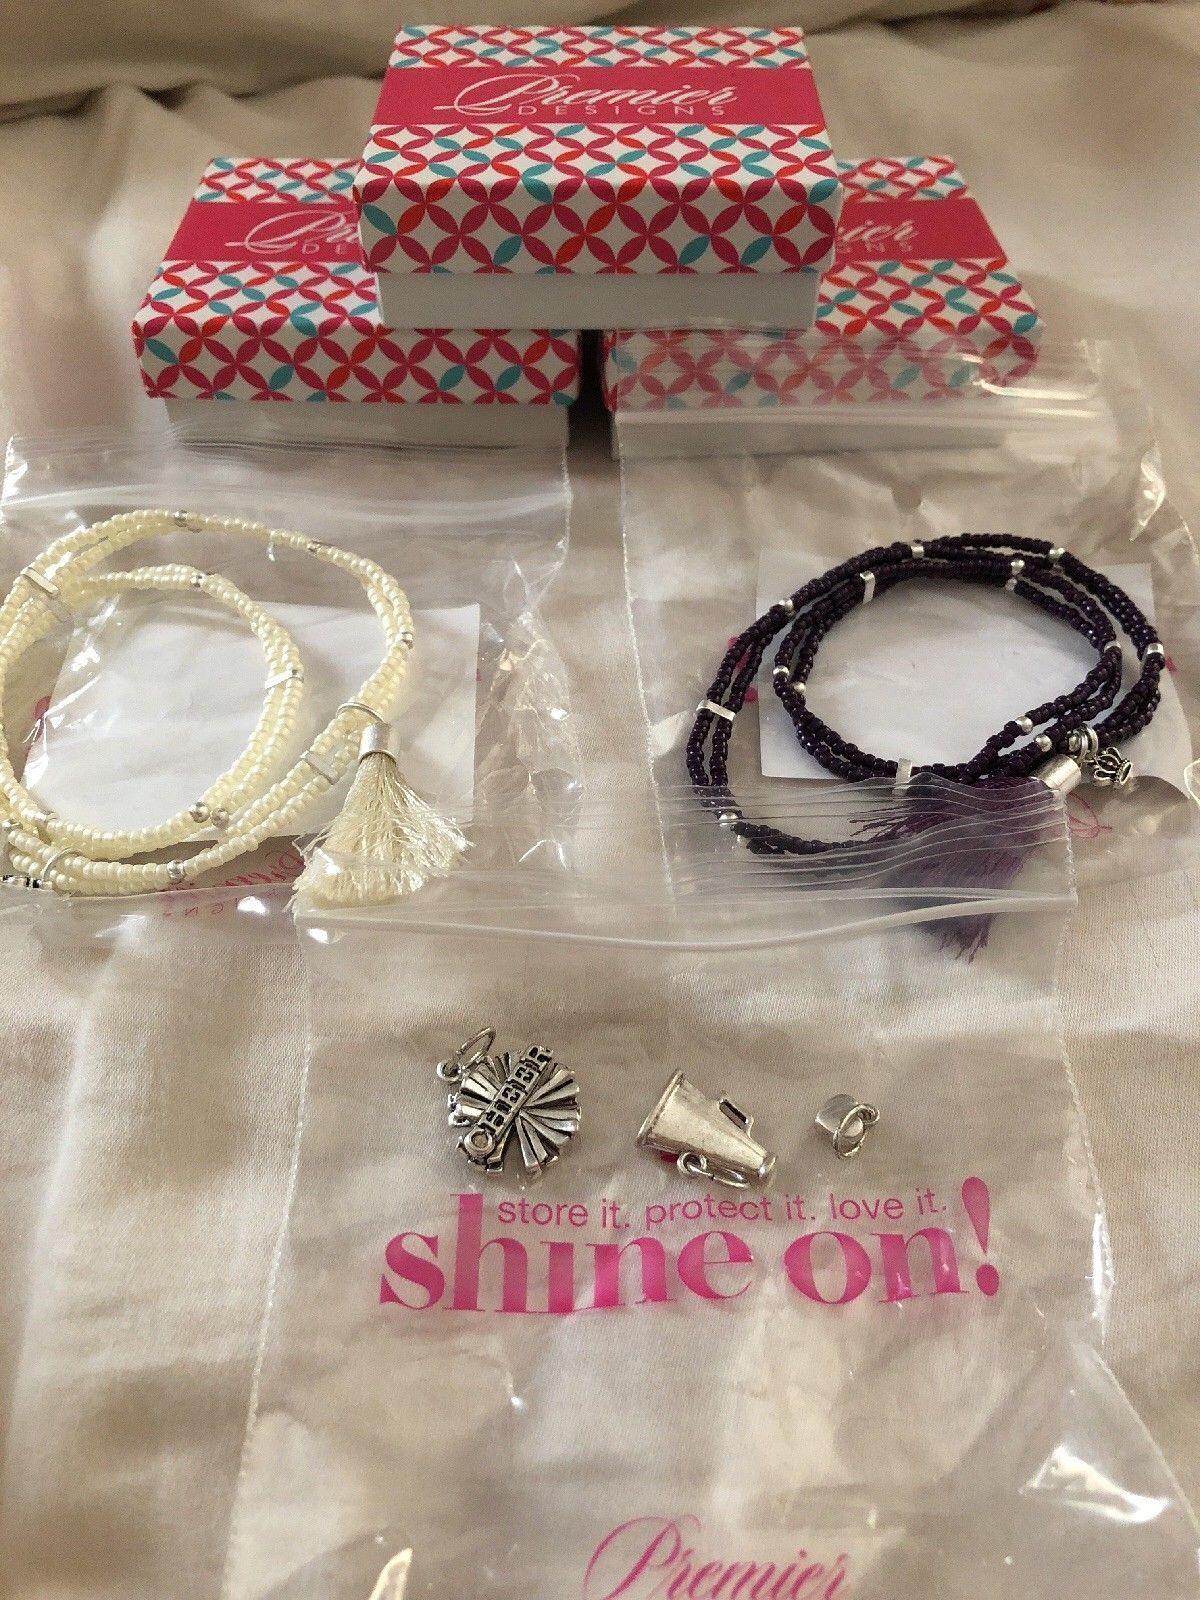 Premier Designs Color Play Bracelets- Purple & White w/Cheer Charms NIB - $56.10